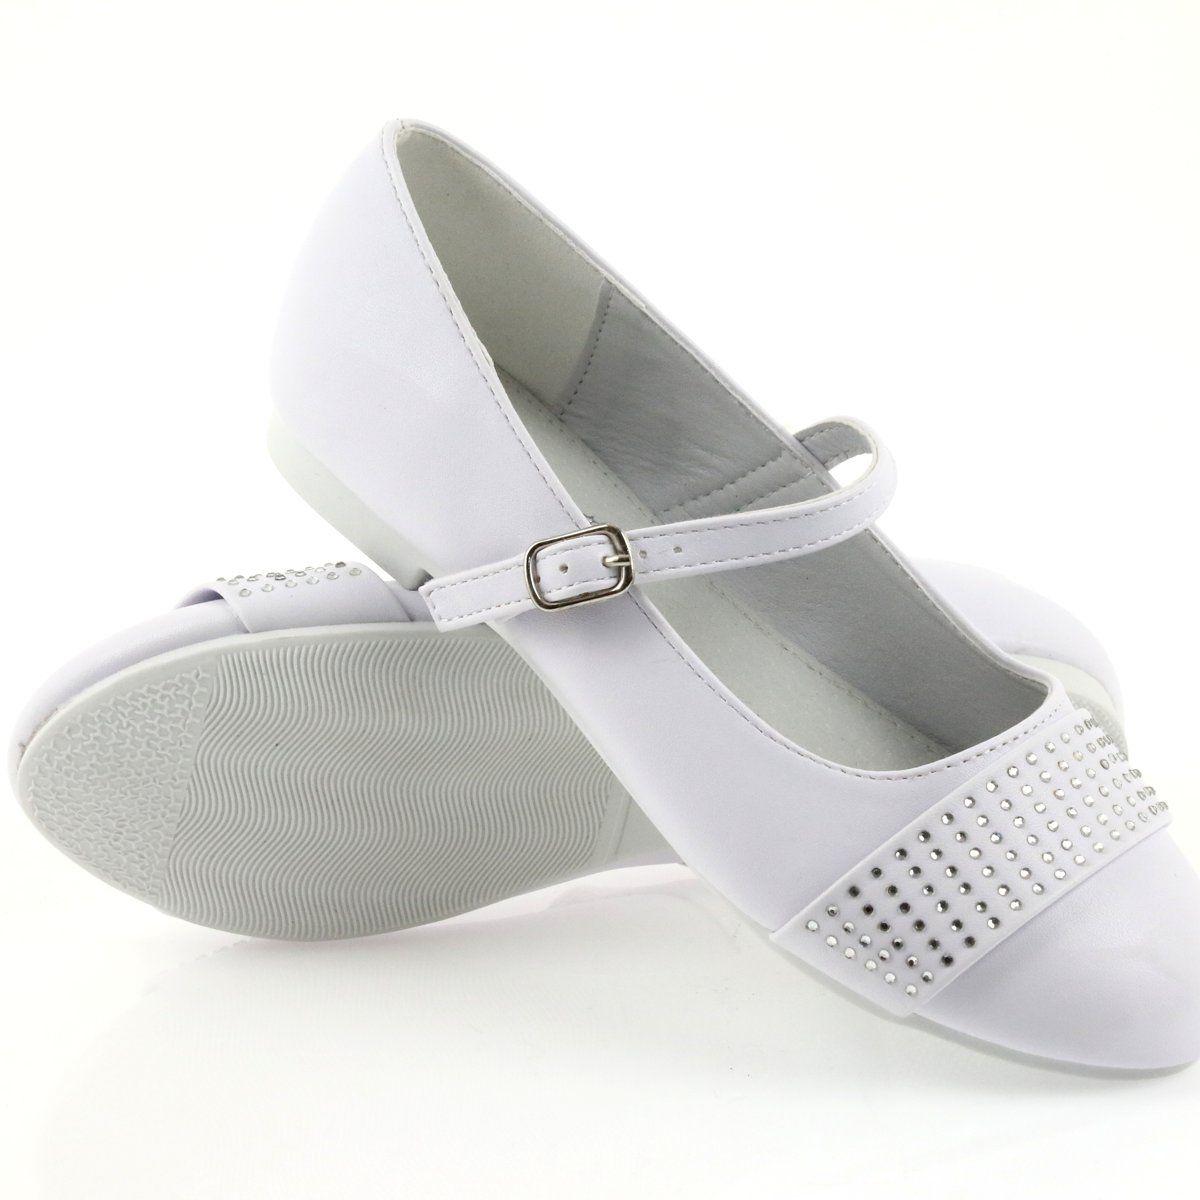 Czolenka Buty Dzieciece Balerinki Komunijne Cyrkonie American Club 11 19 Biale Childrens Ballet Shoes Childrens Shoes Pumps